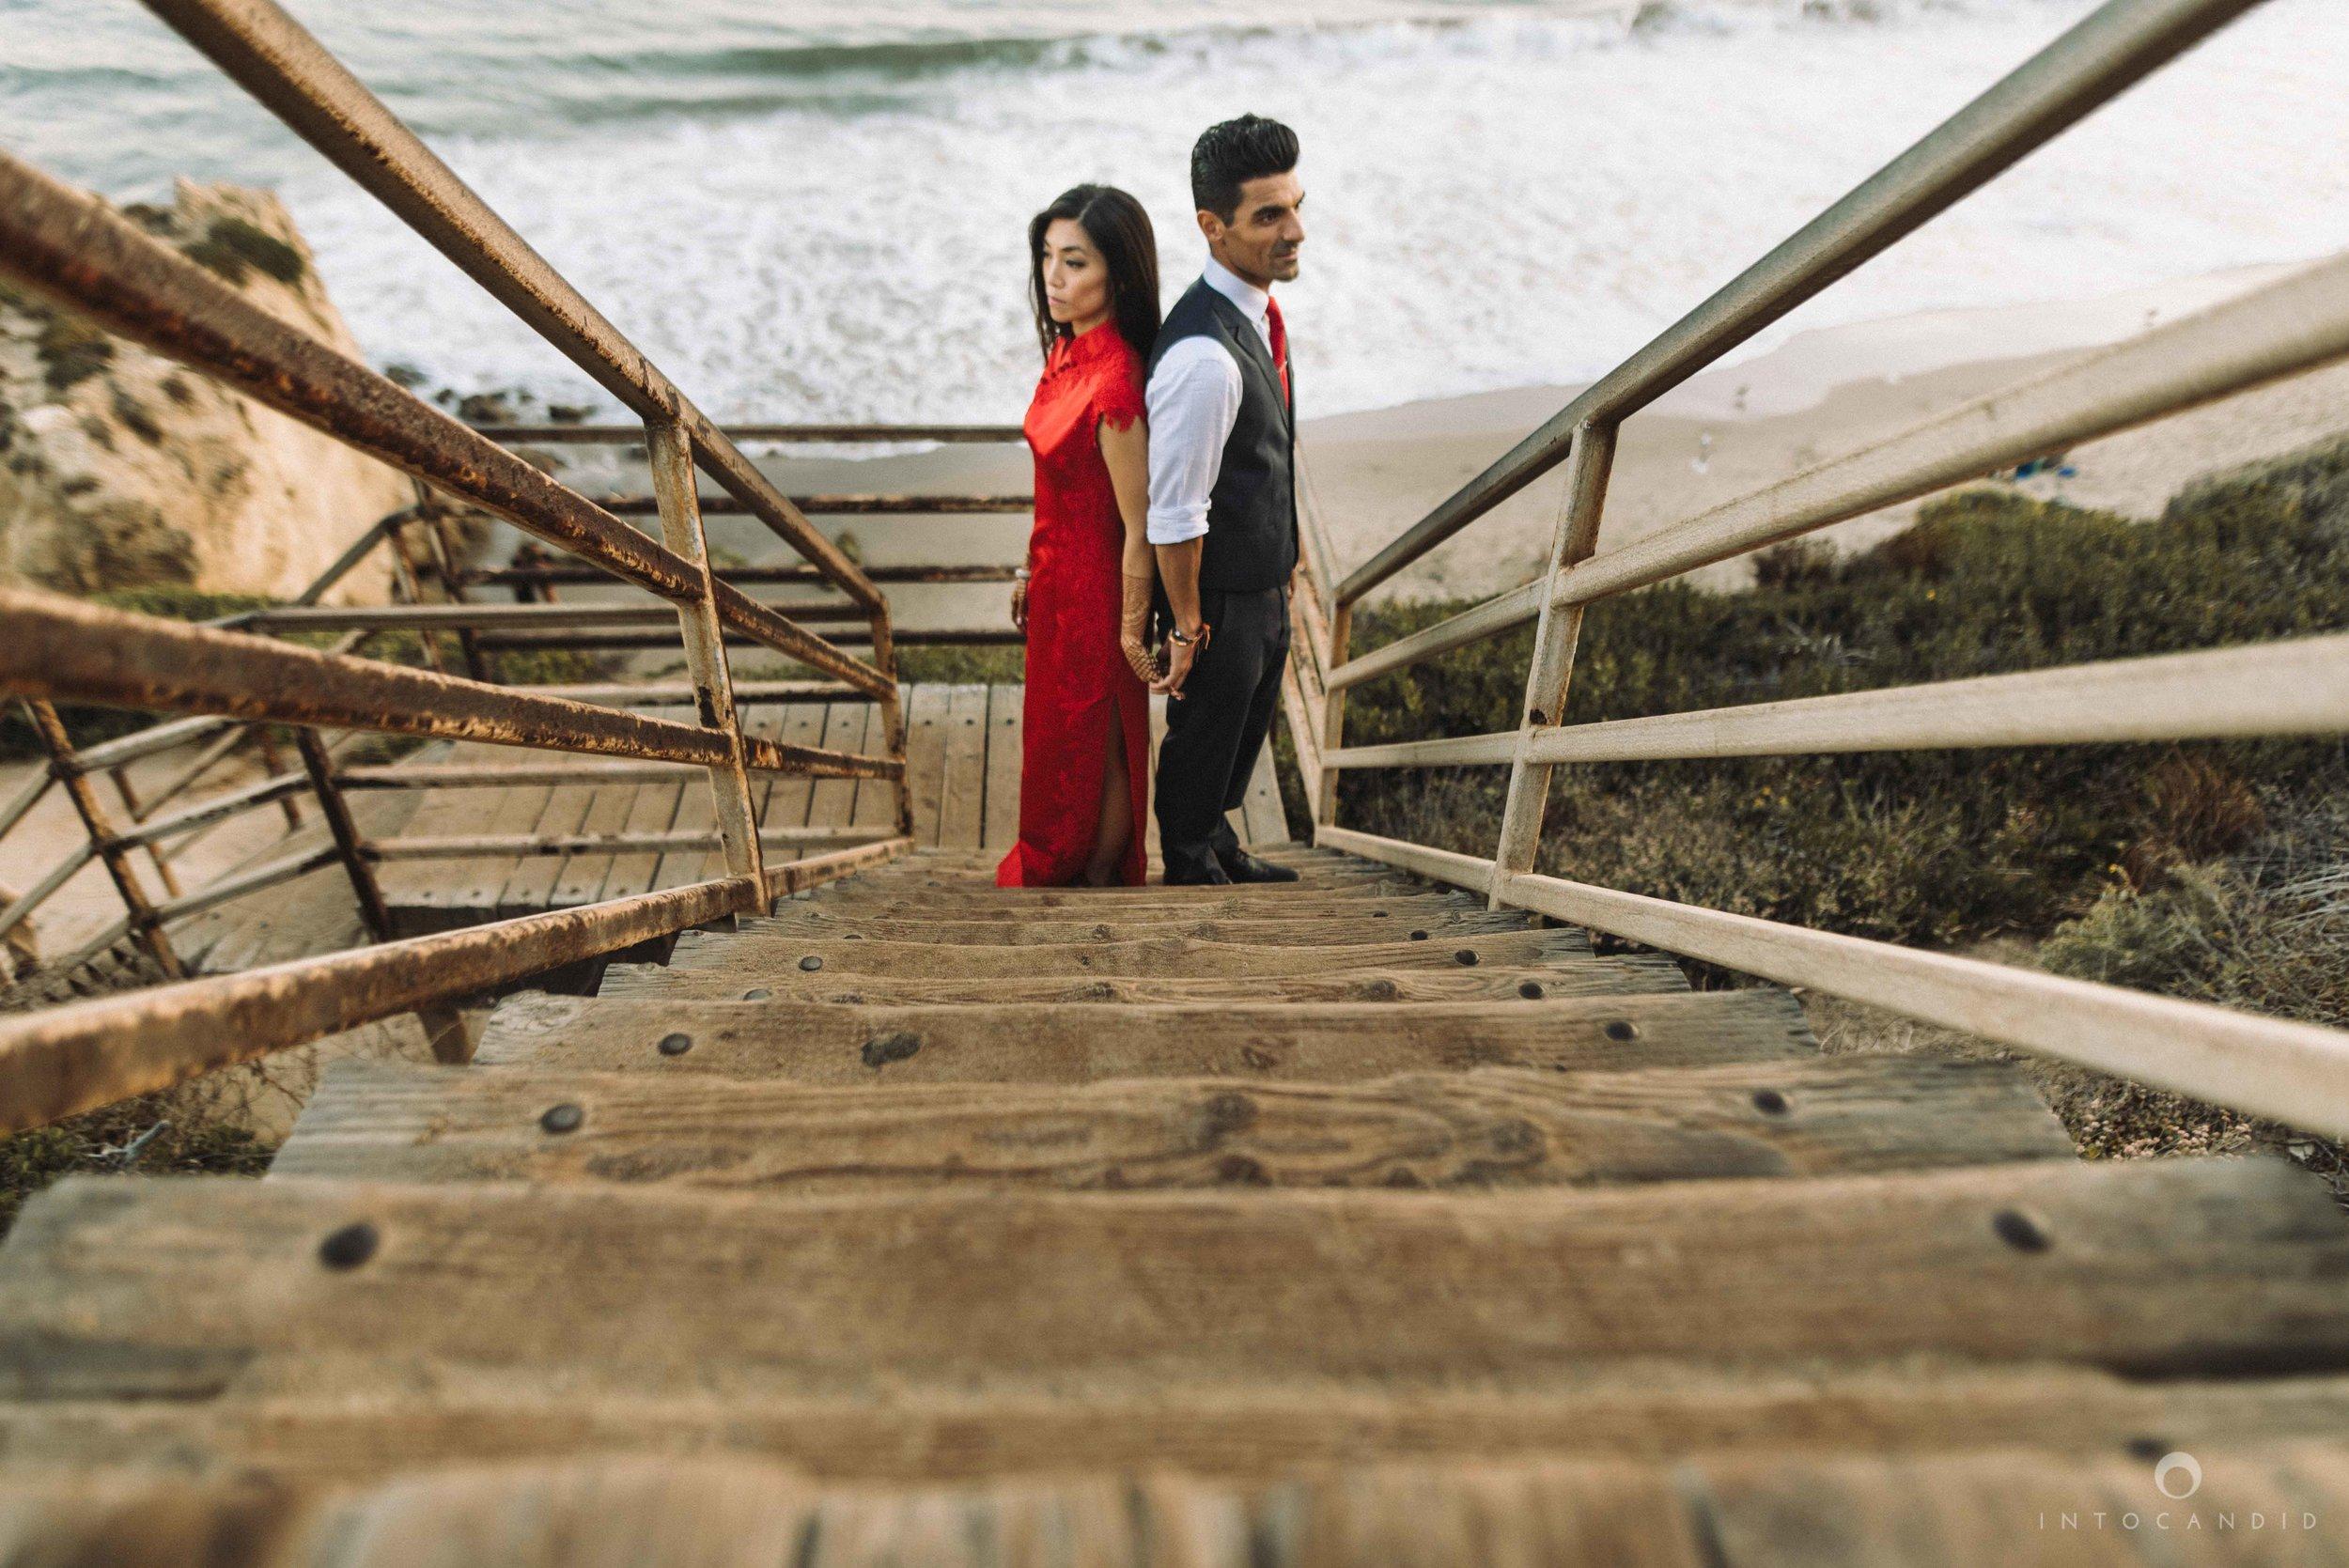 Malibu_California_Engagement_Photographer_AS_10.JPG